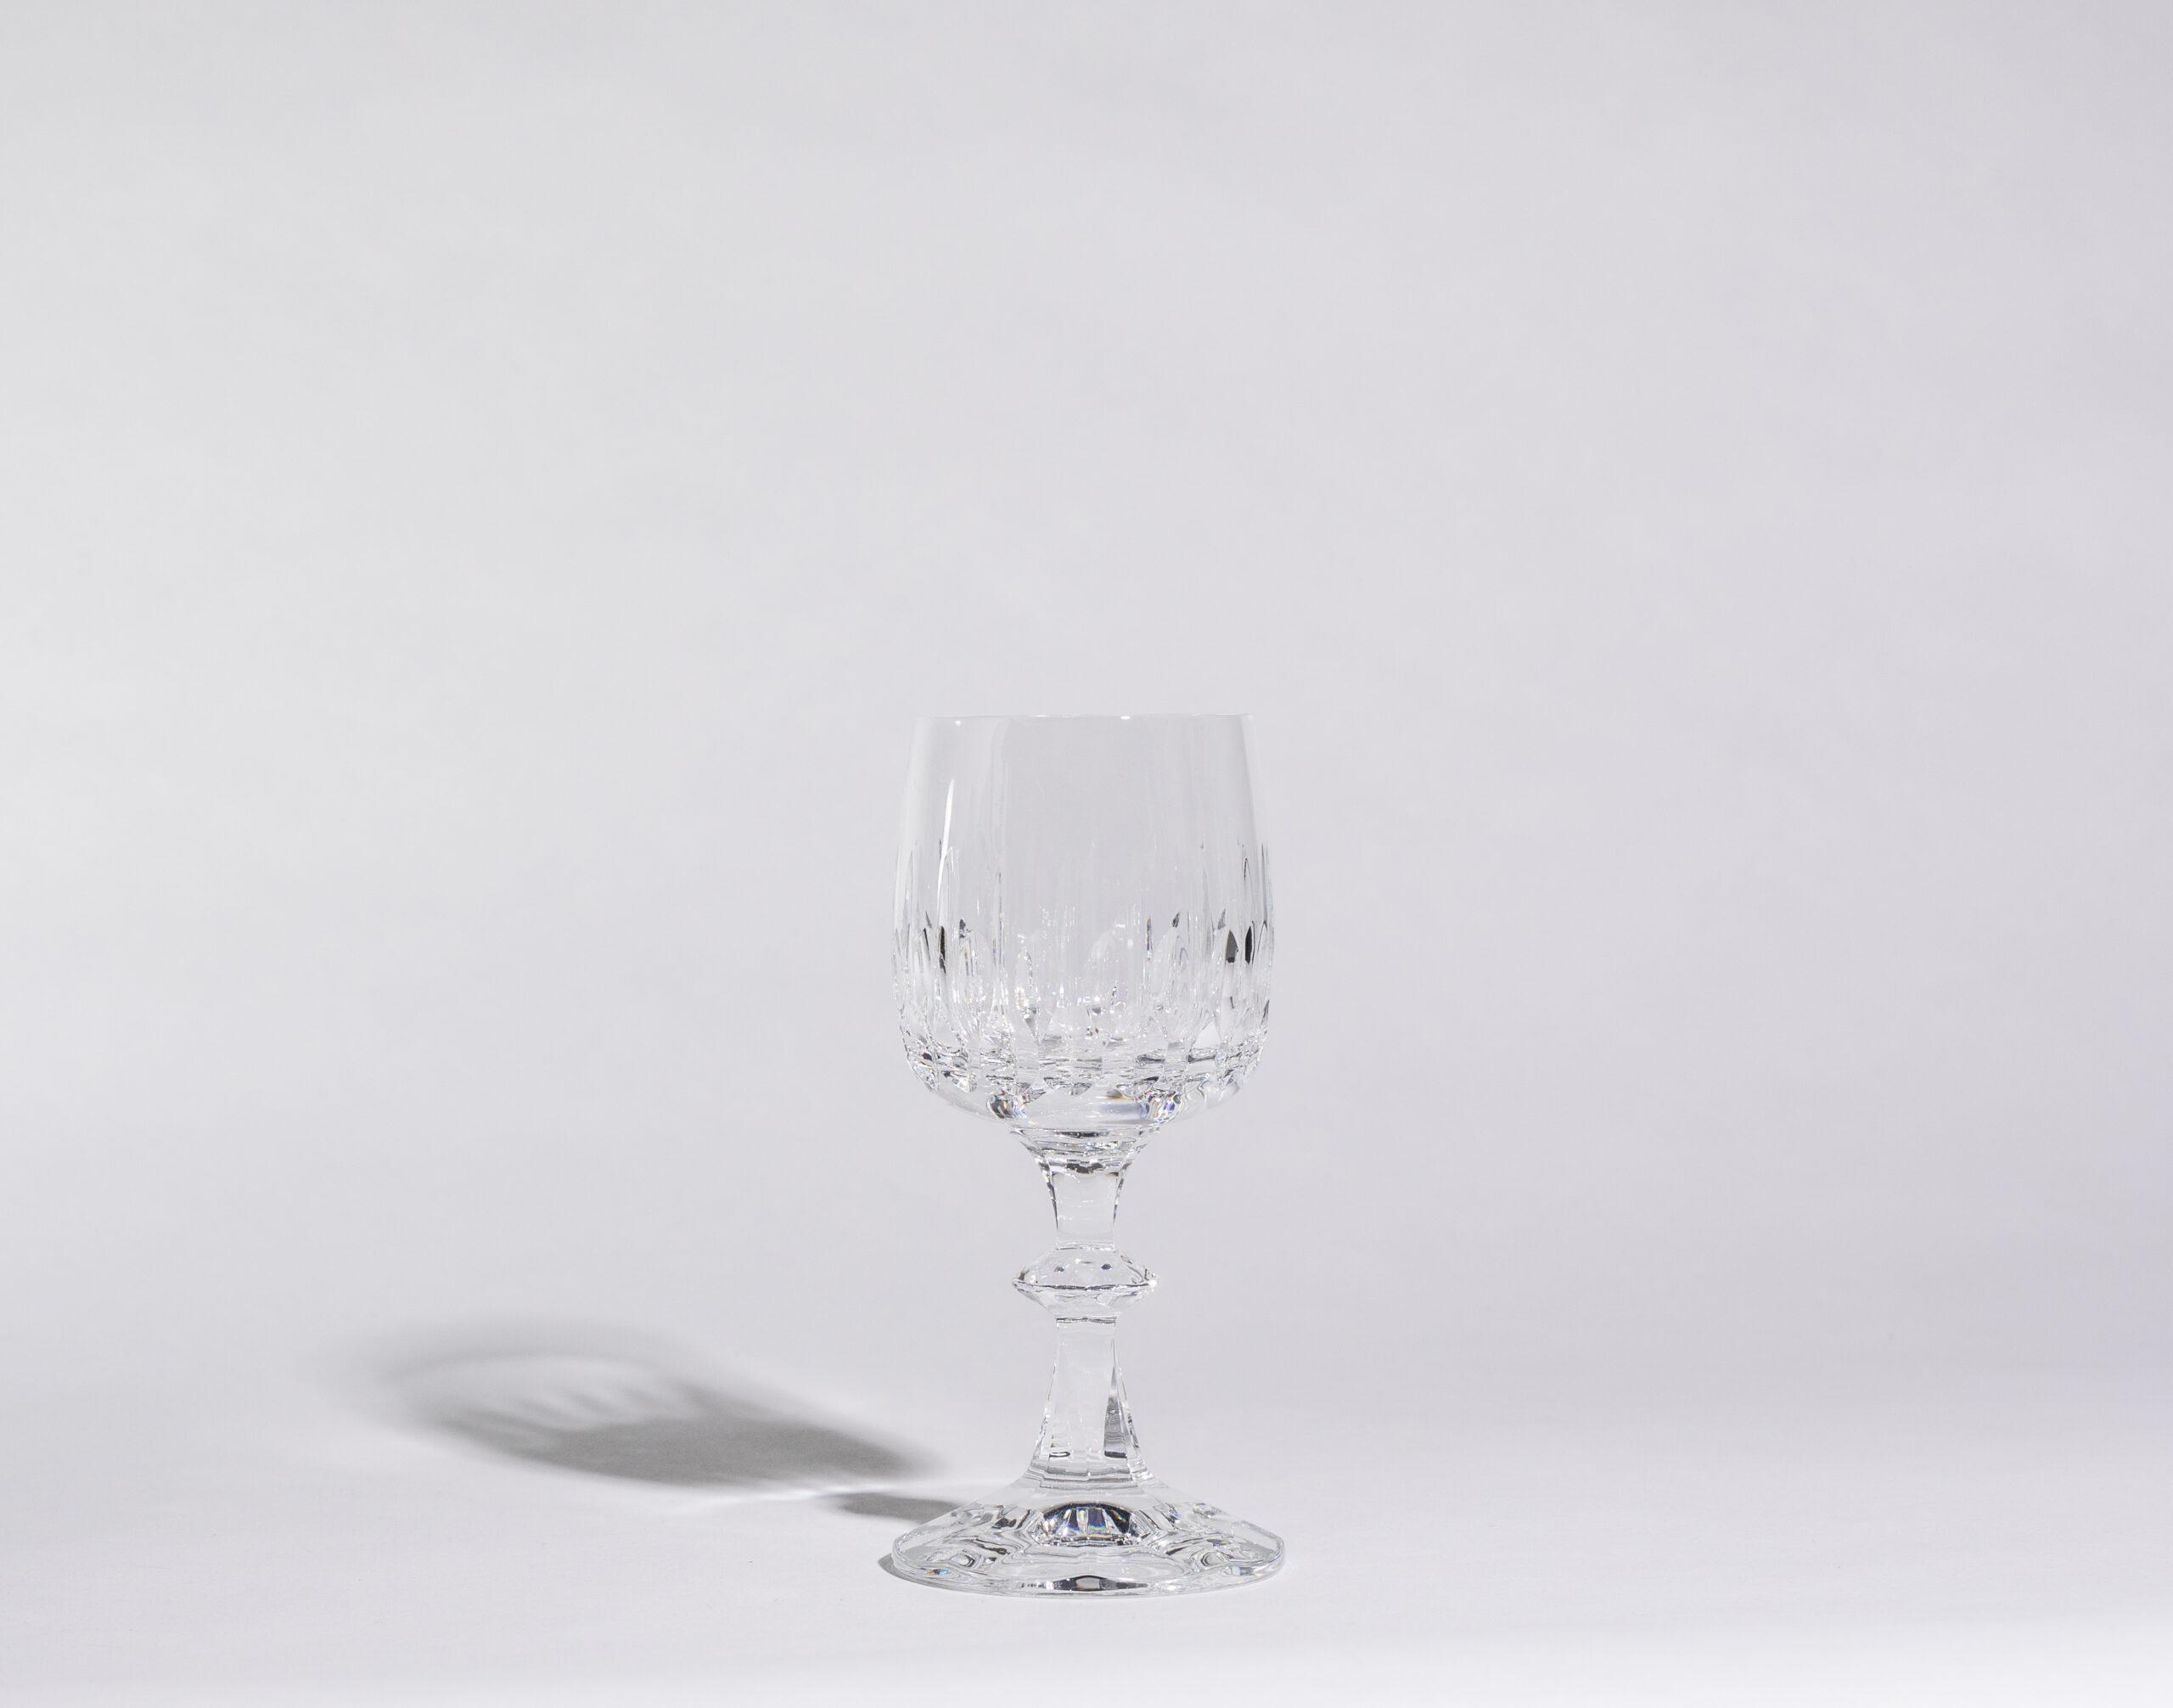 Sherry glasses (4oz, stemmed)